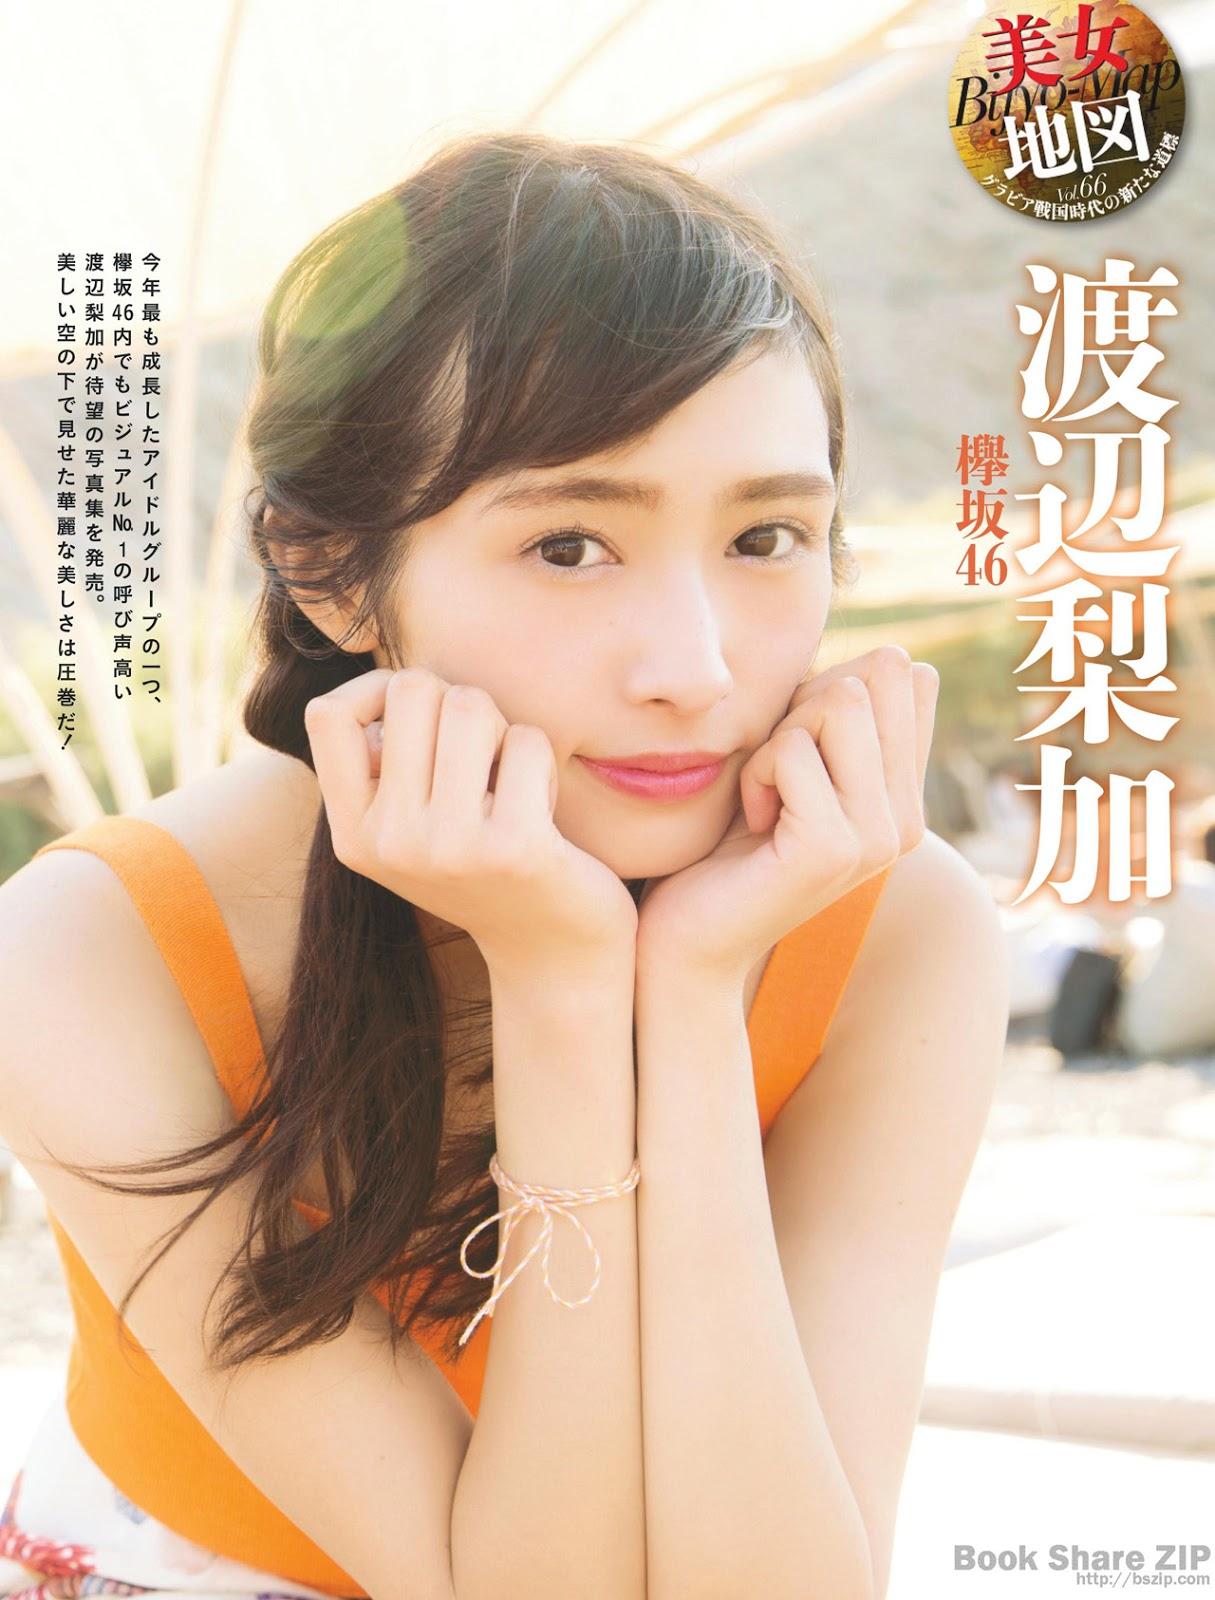 Watanabe Rika 渡辺梨加, Weekly SPA! 2017.12.19 (週刊SPA! 2017年12月19日号)